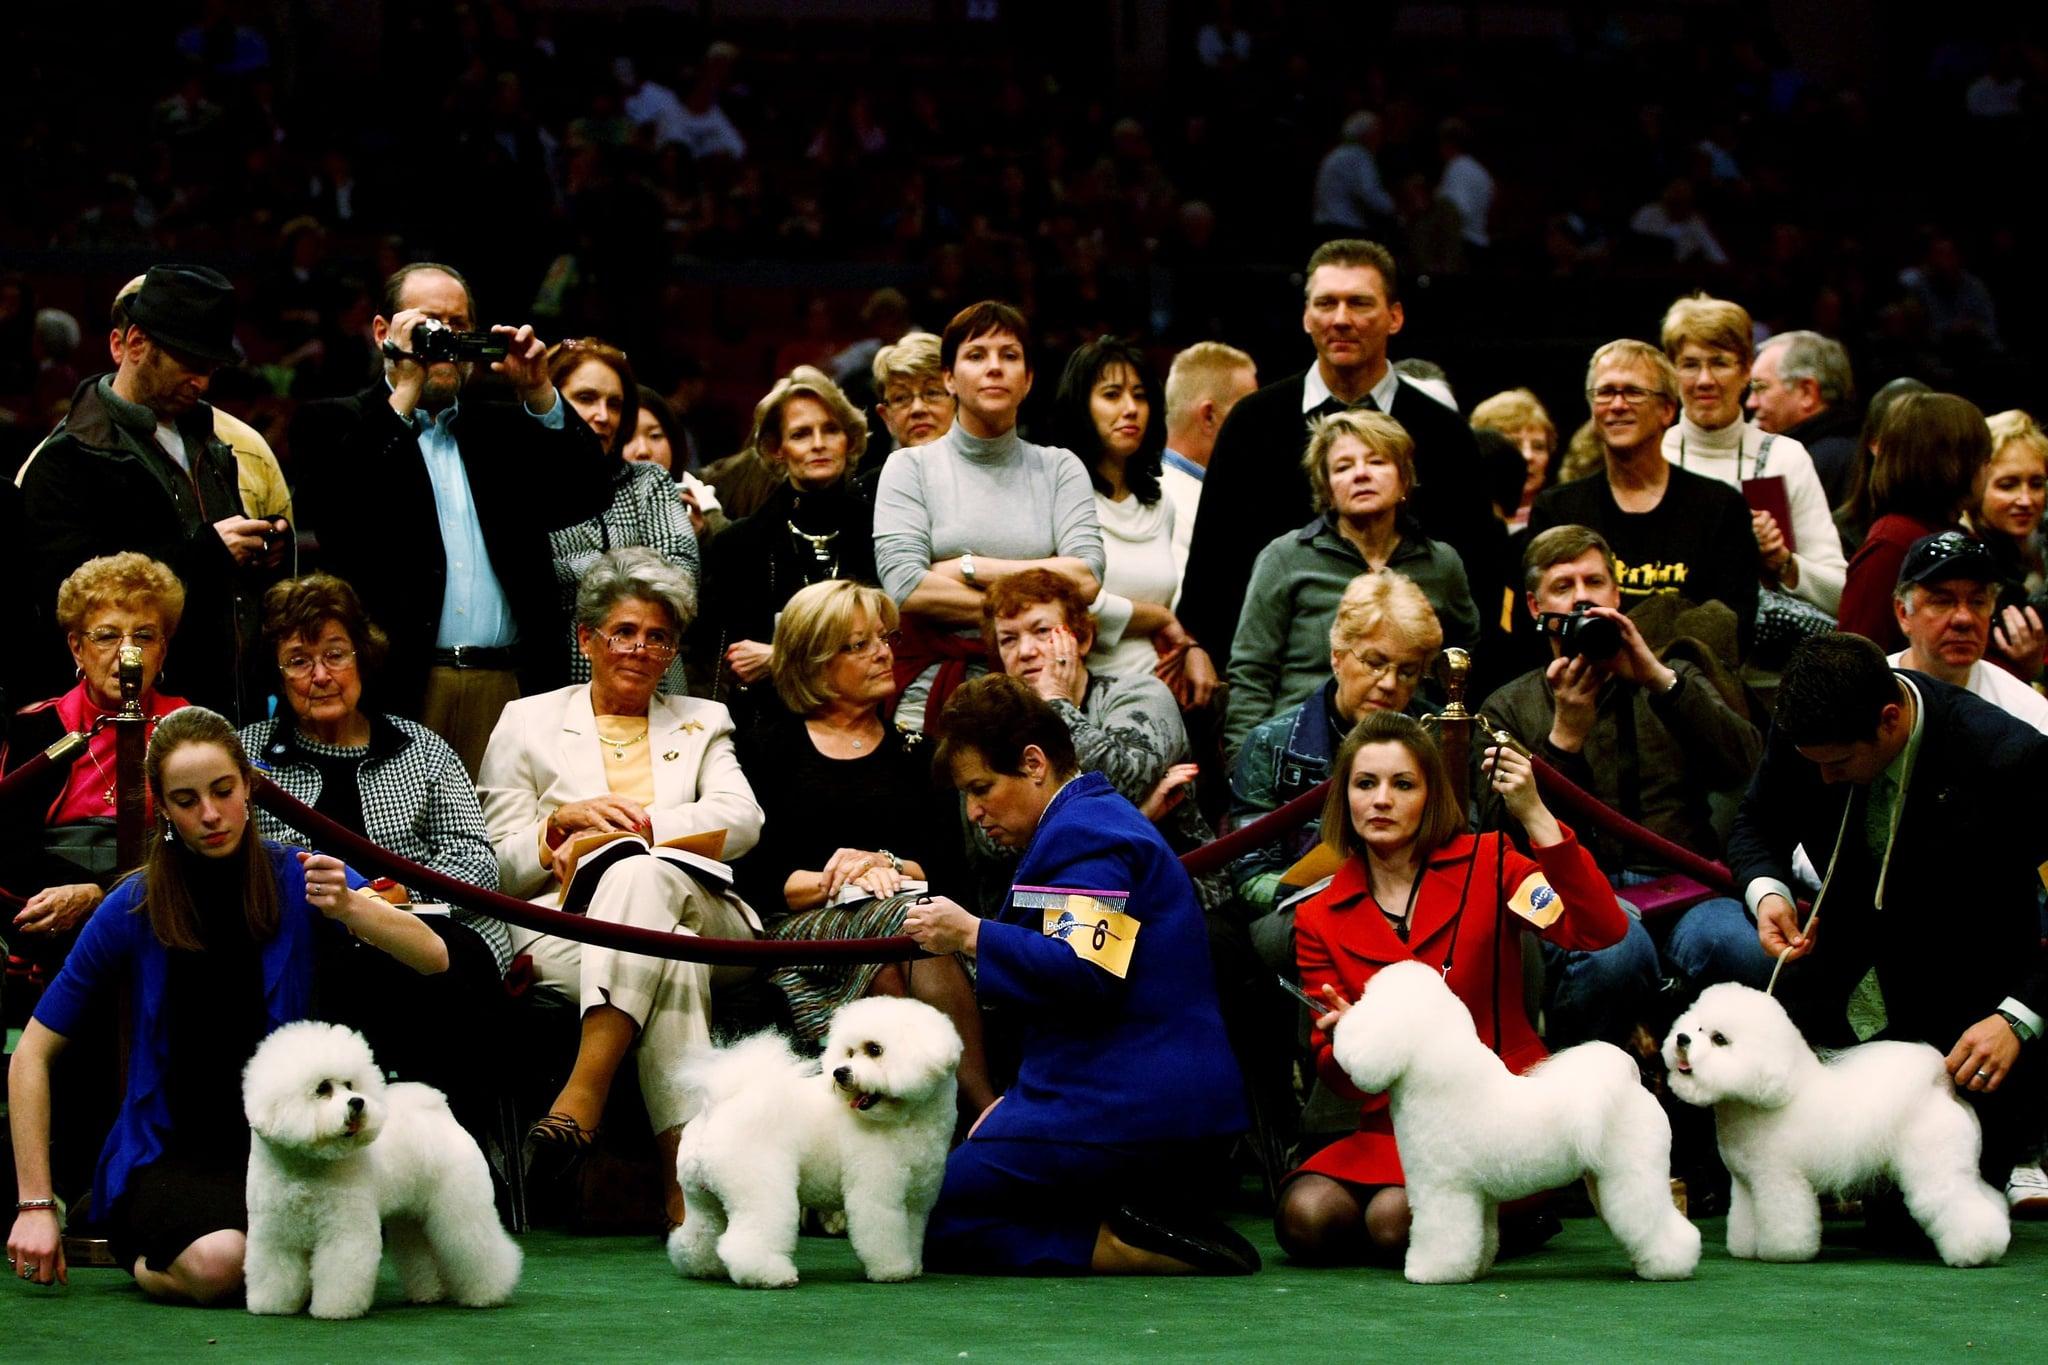 Westminster Dog Show Group Order